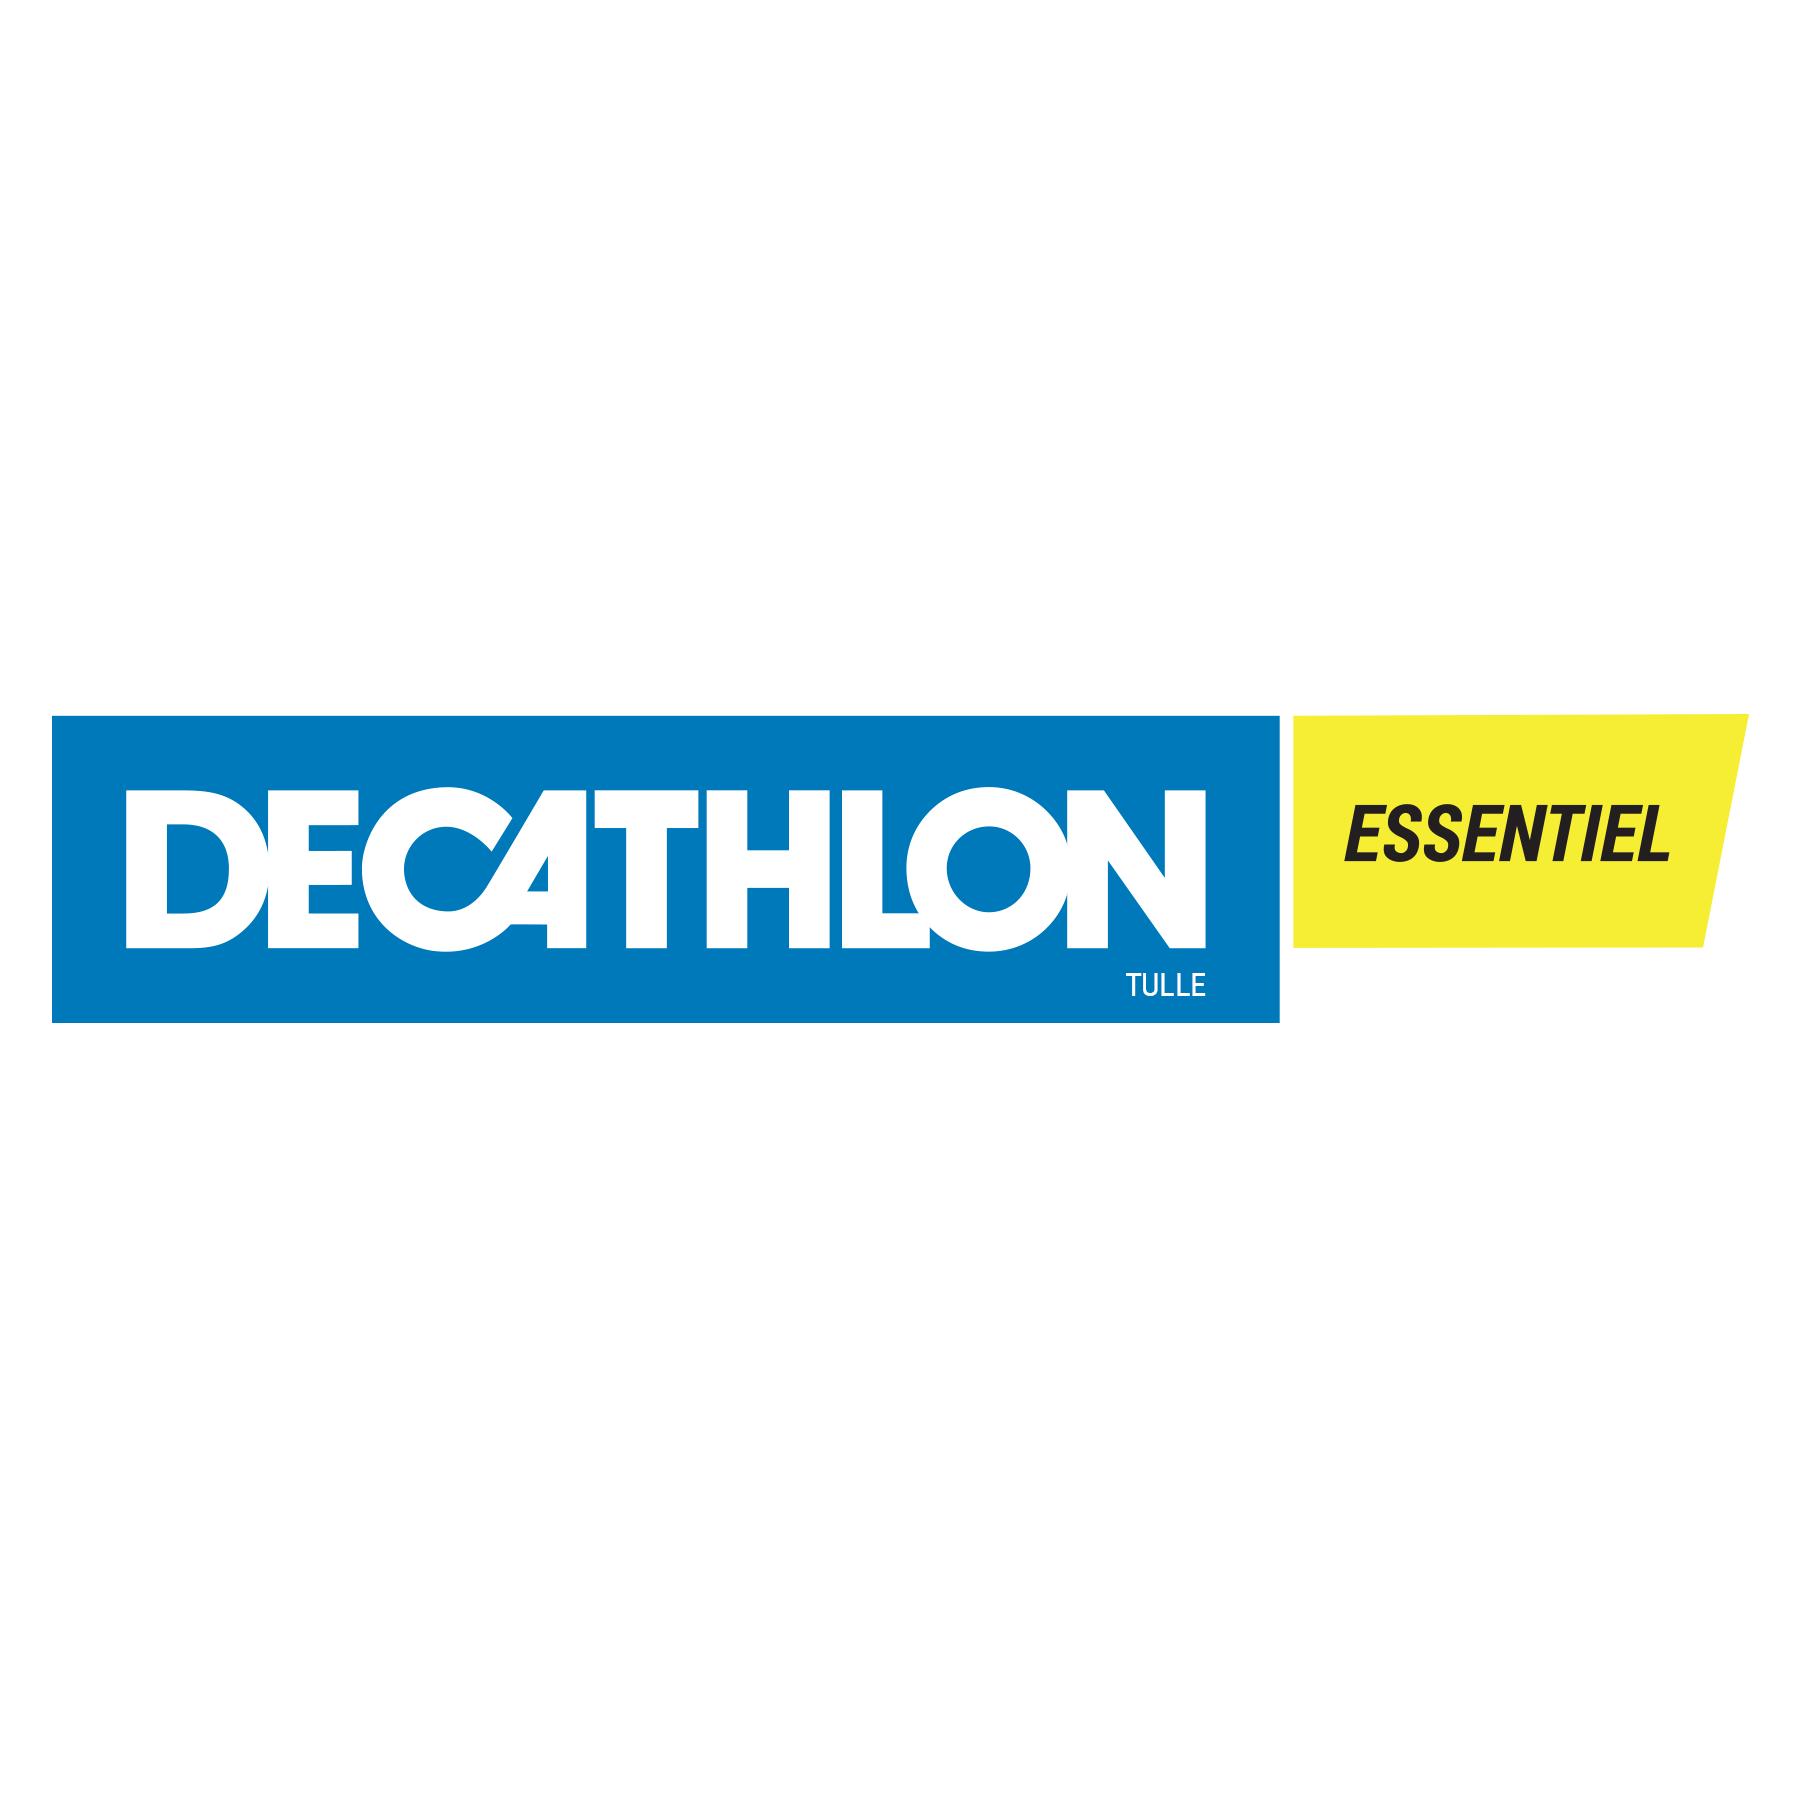 Decathlon Essentiel Tulle